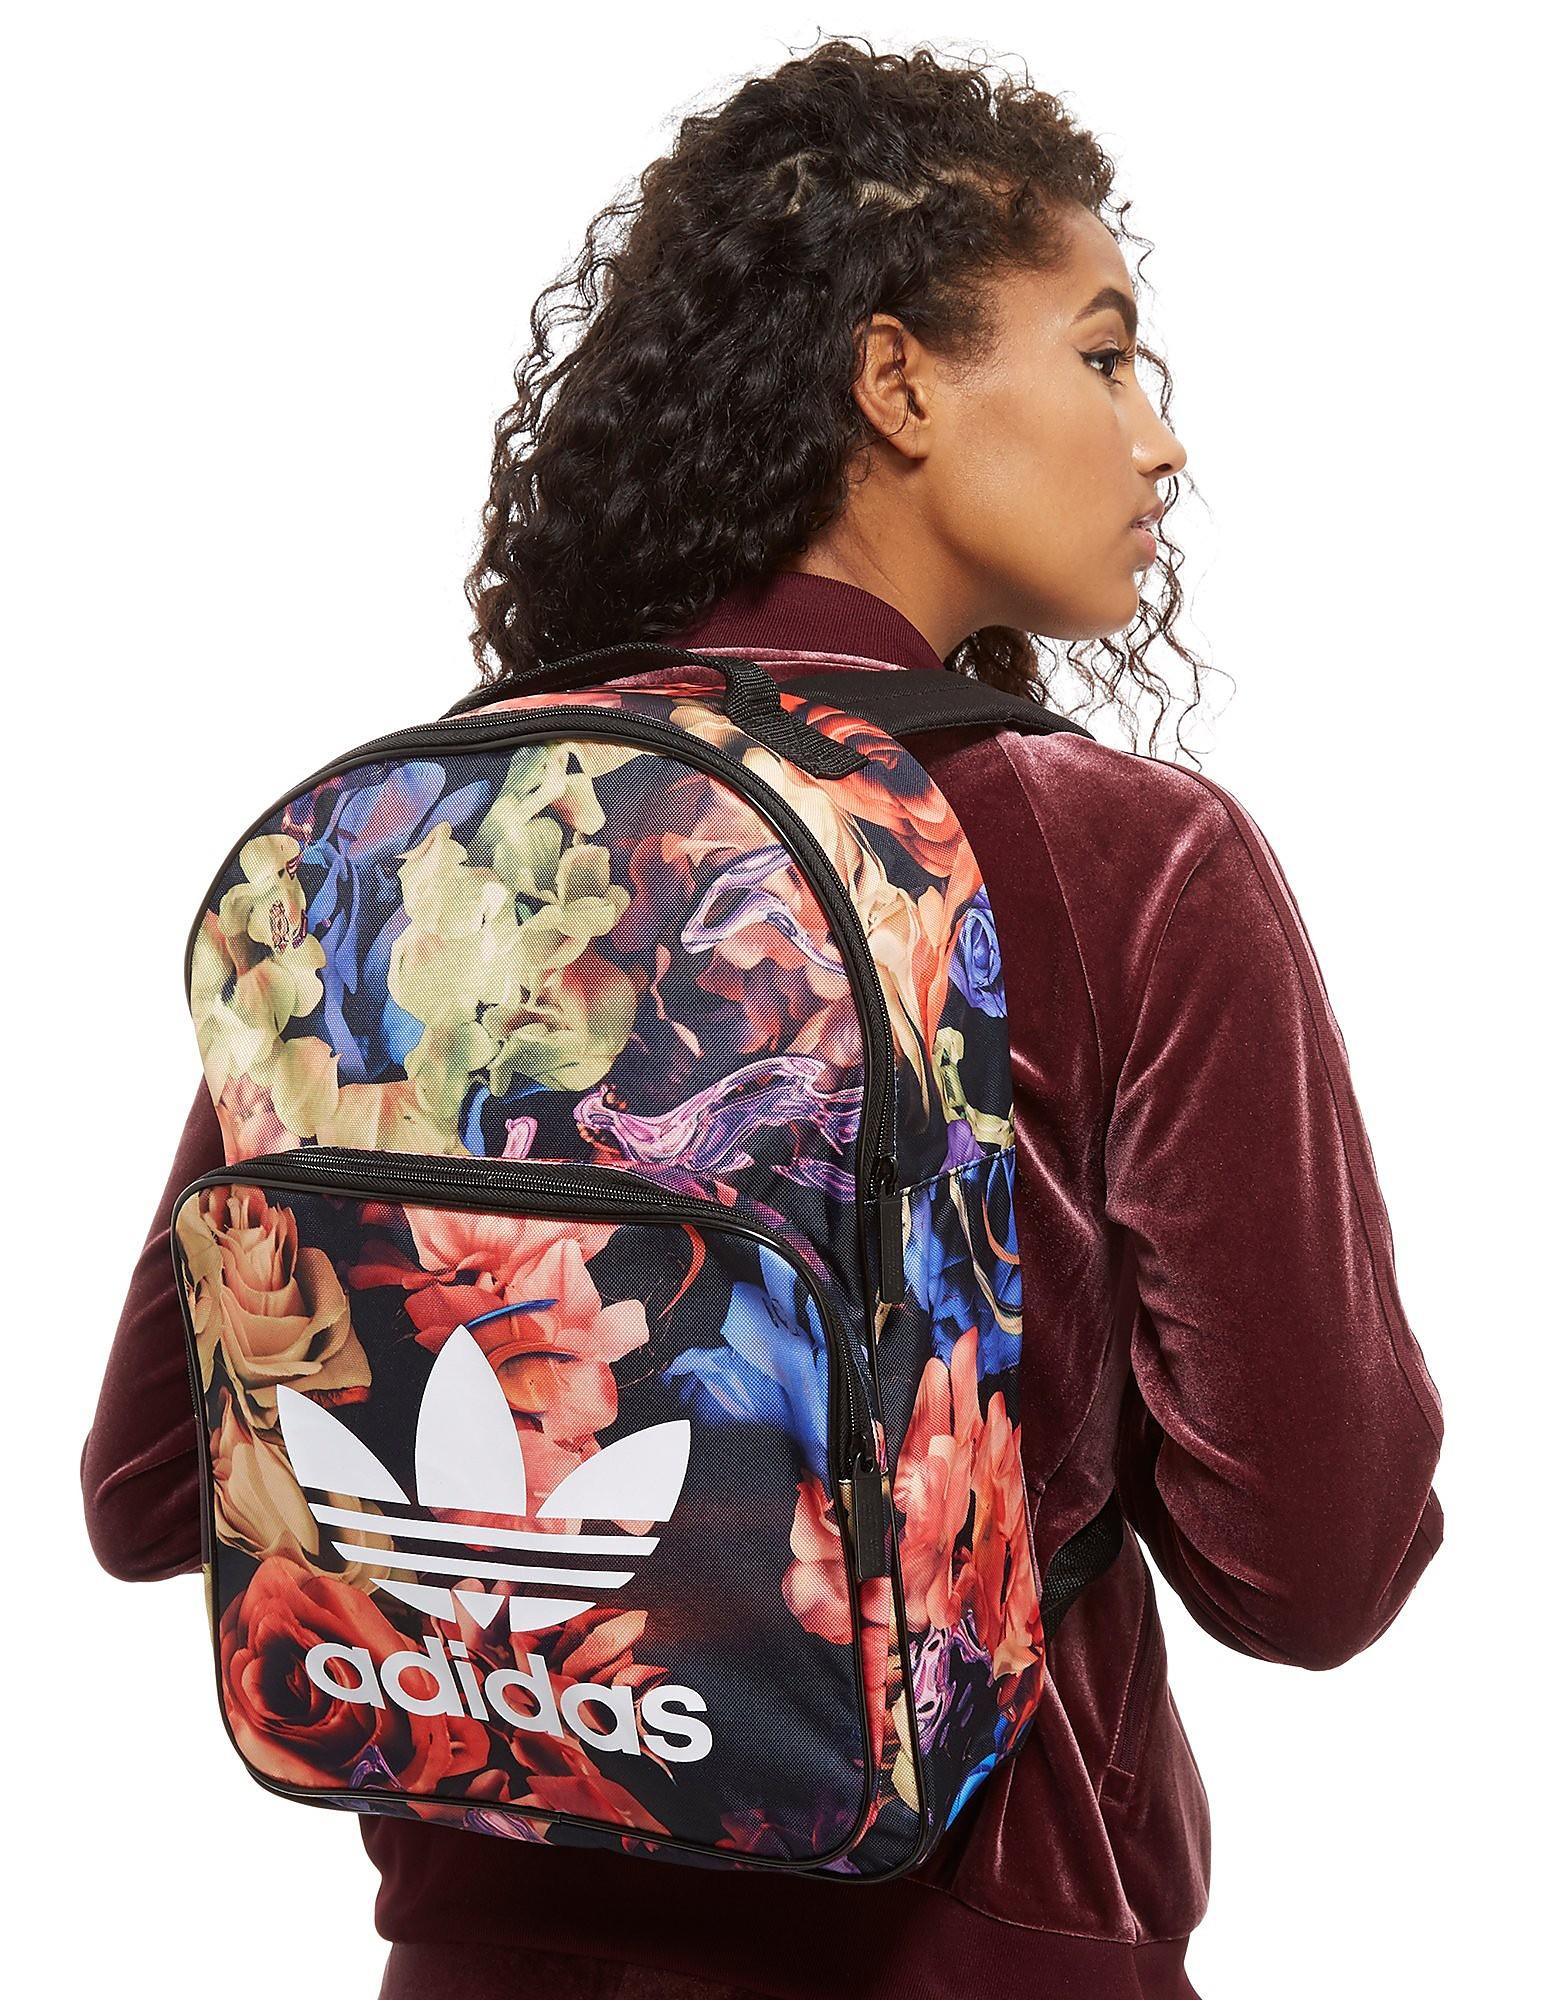 adidas Originals Rose Backpack